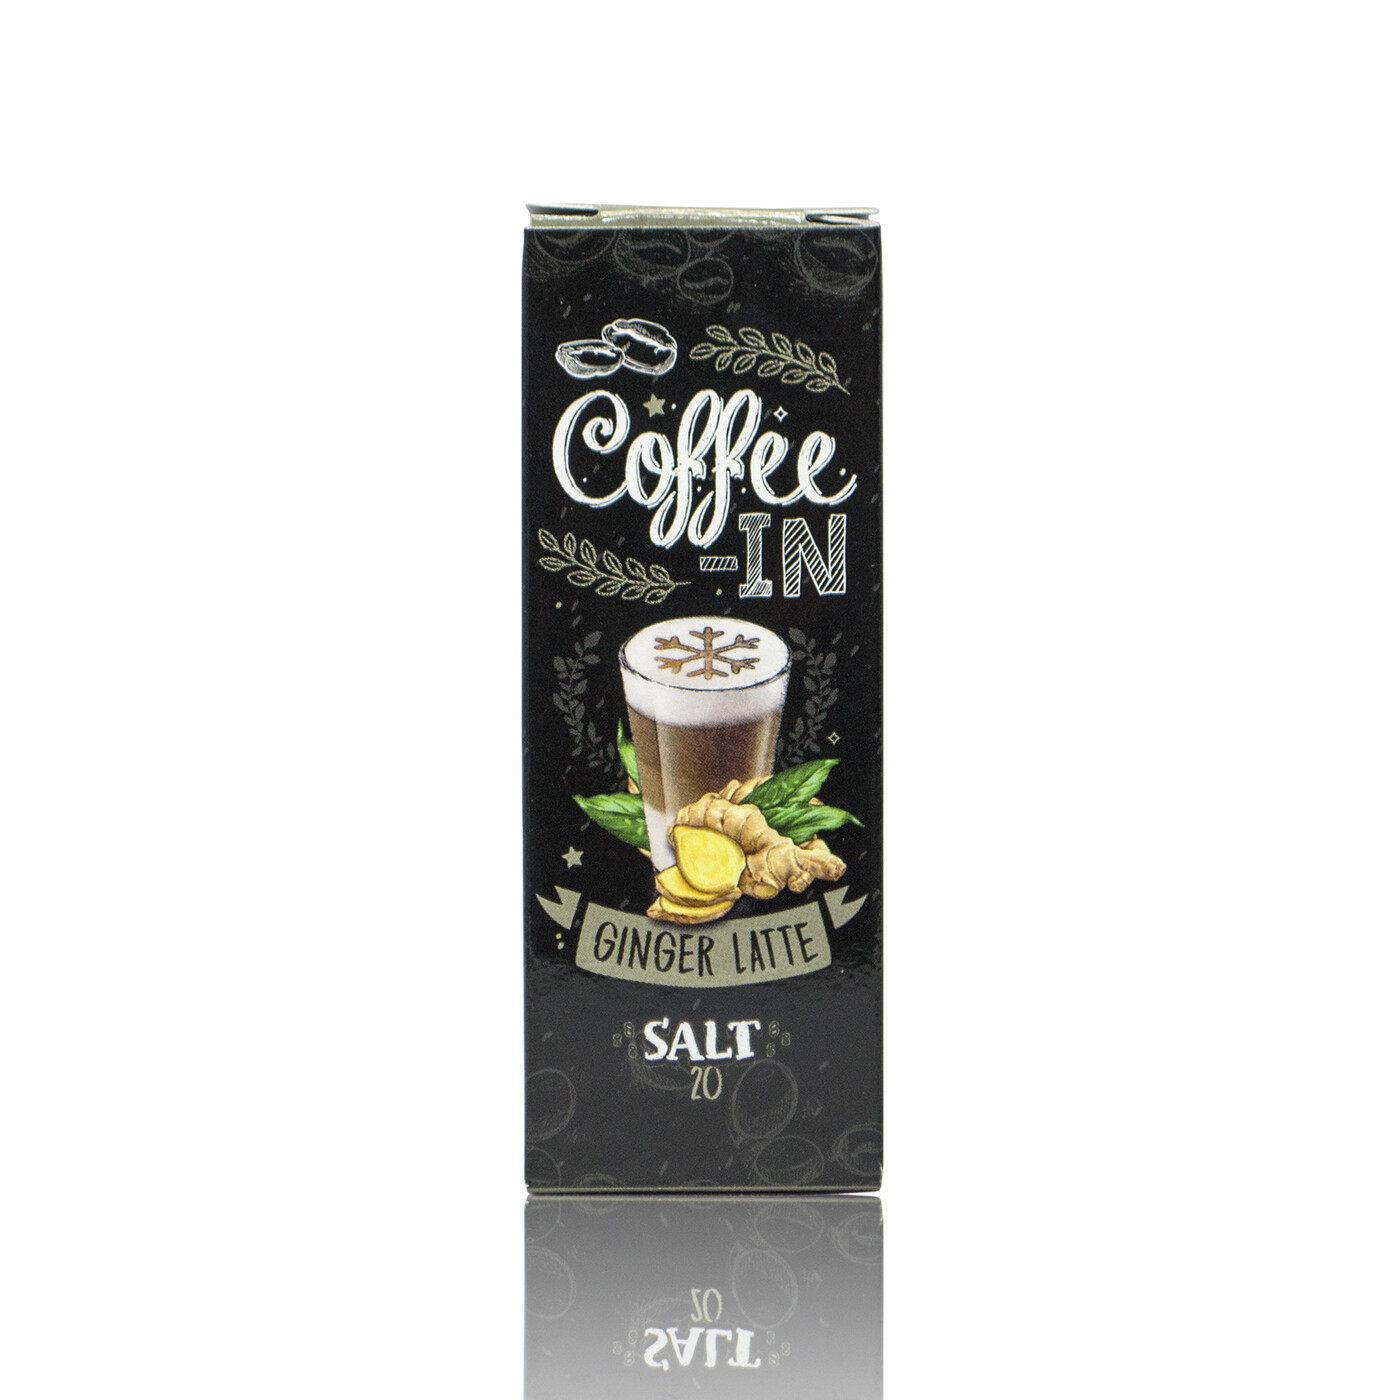 COFFE-IN SALT: GINGER LATTE 20MG STRONG